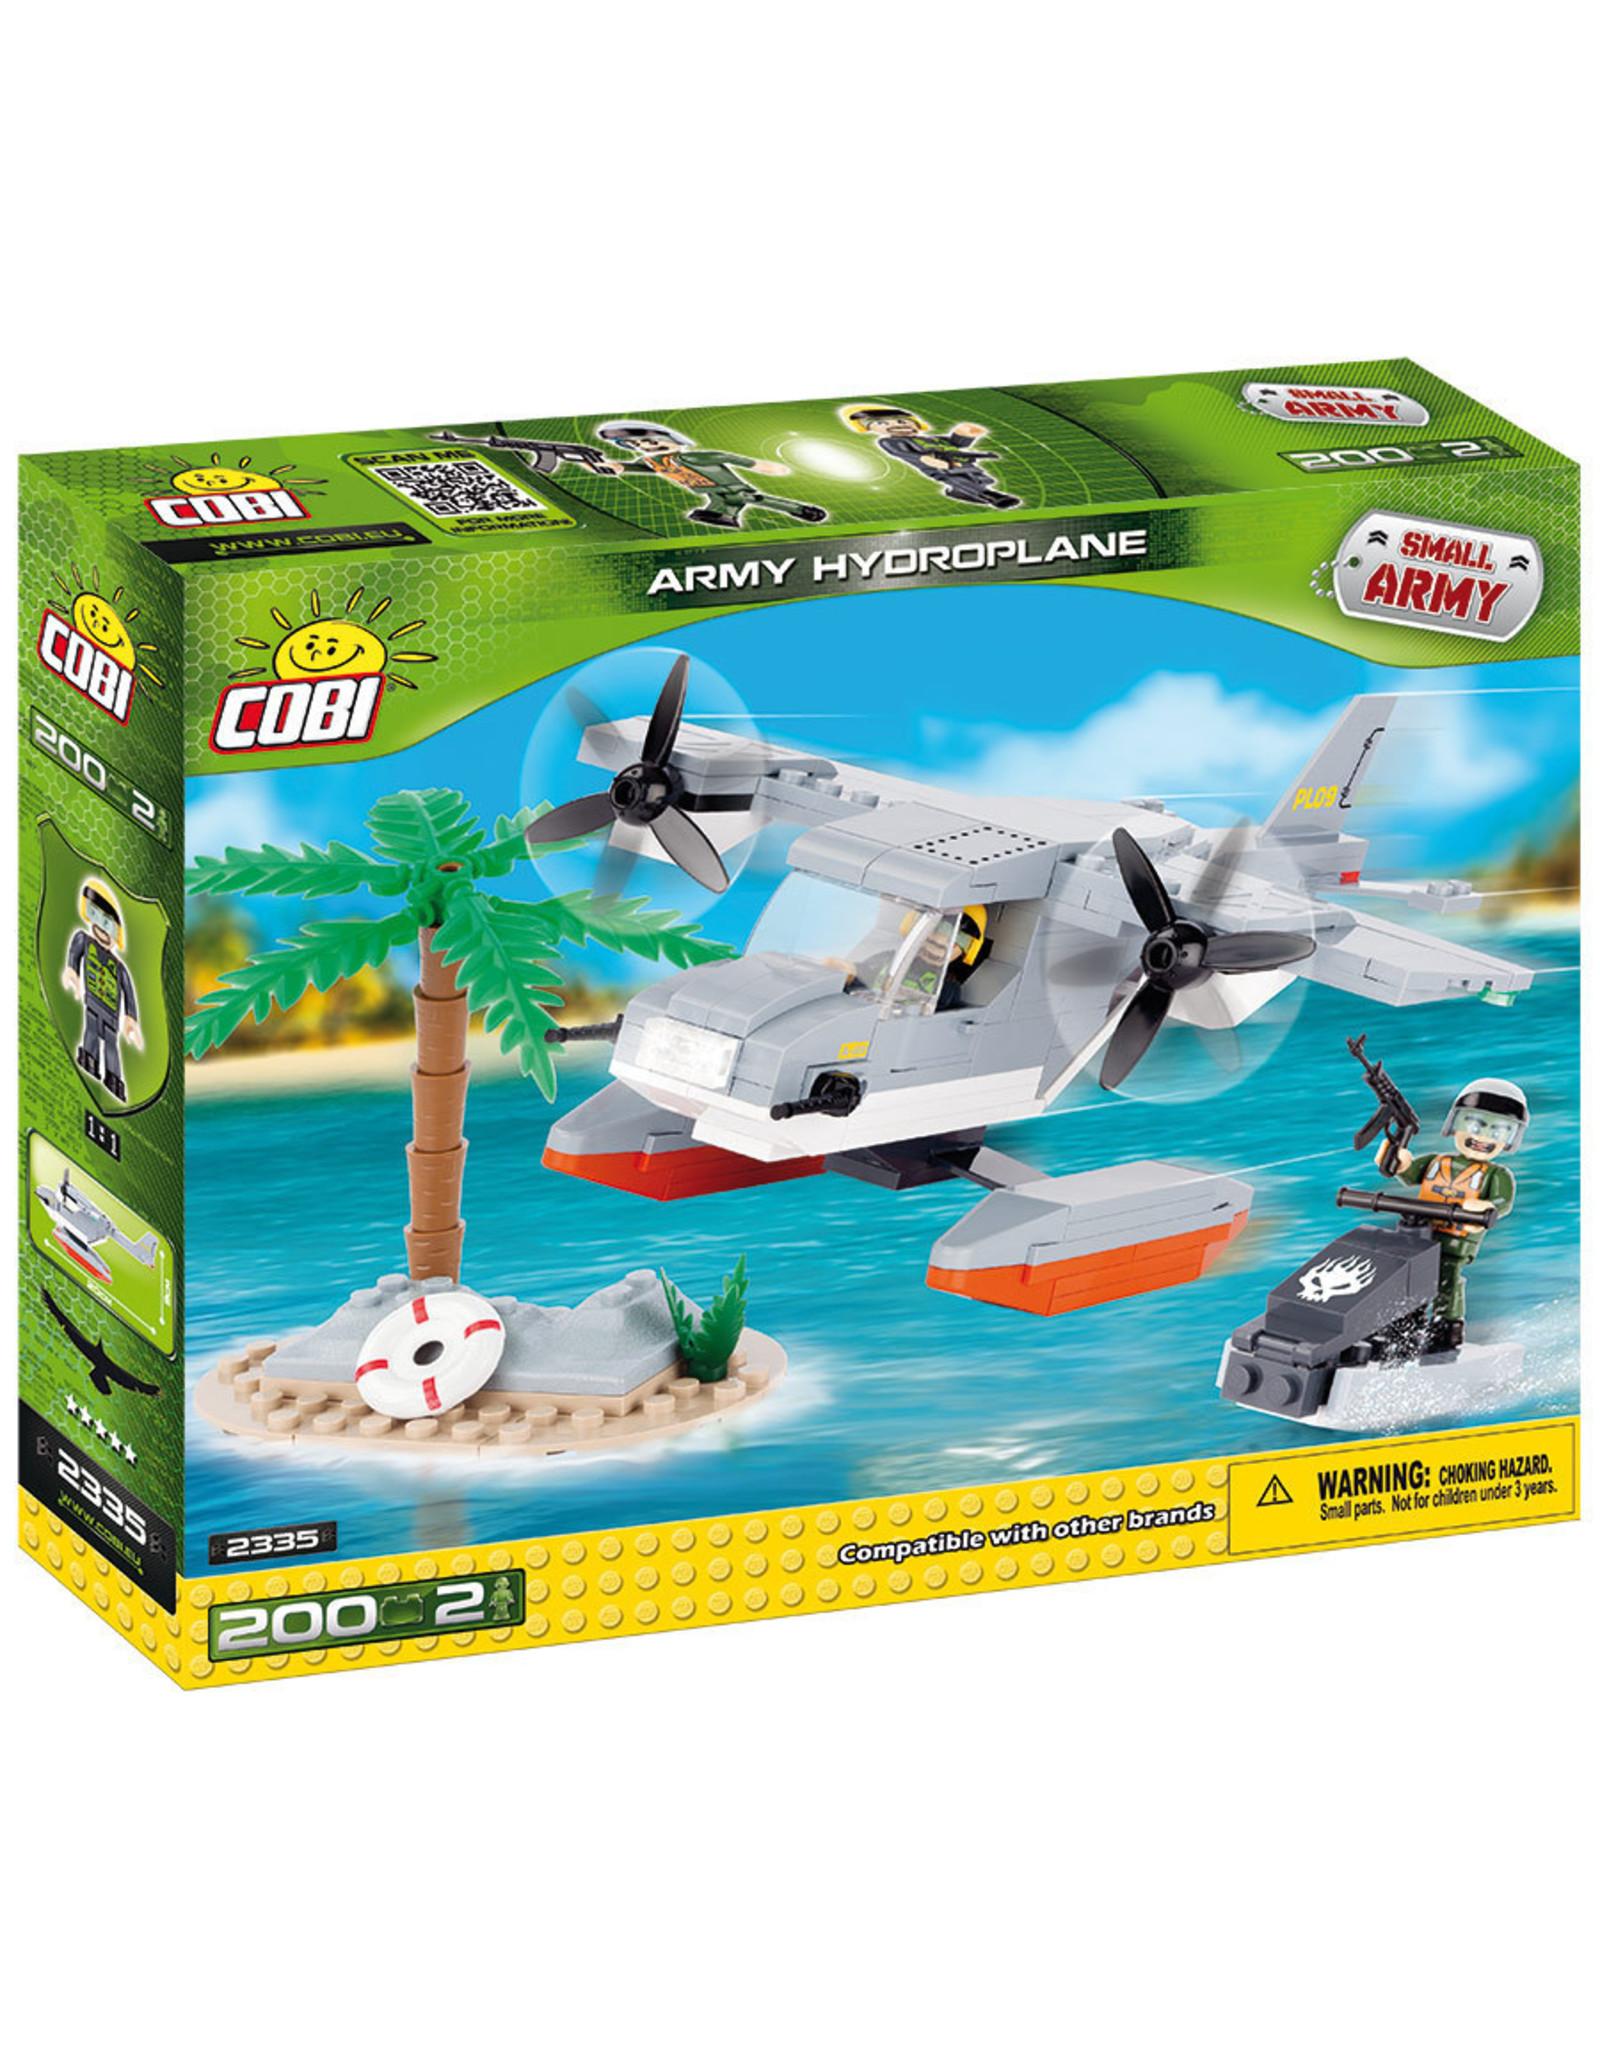 COBI COBI  2335 - Hydroplane